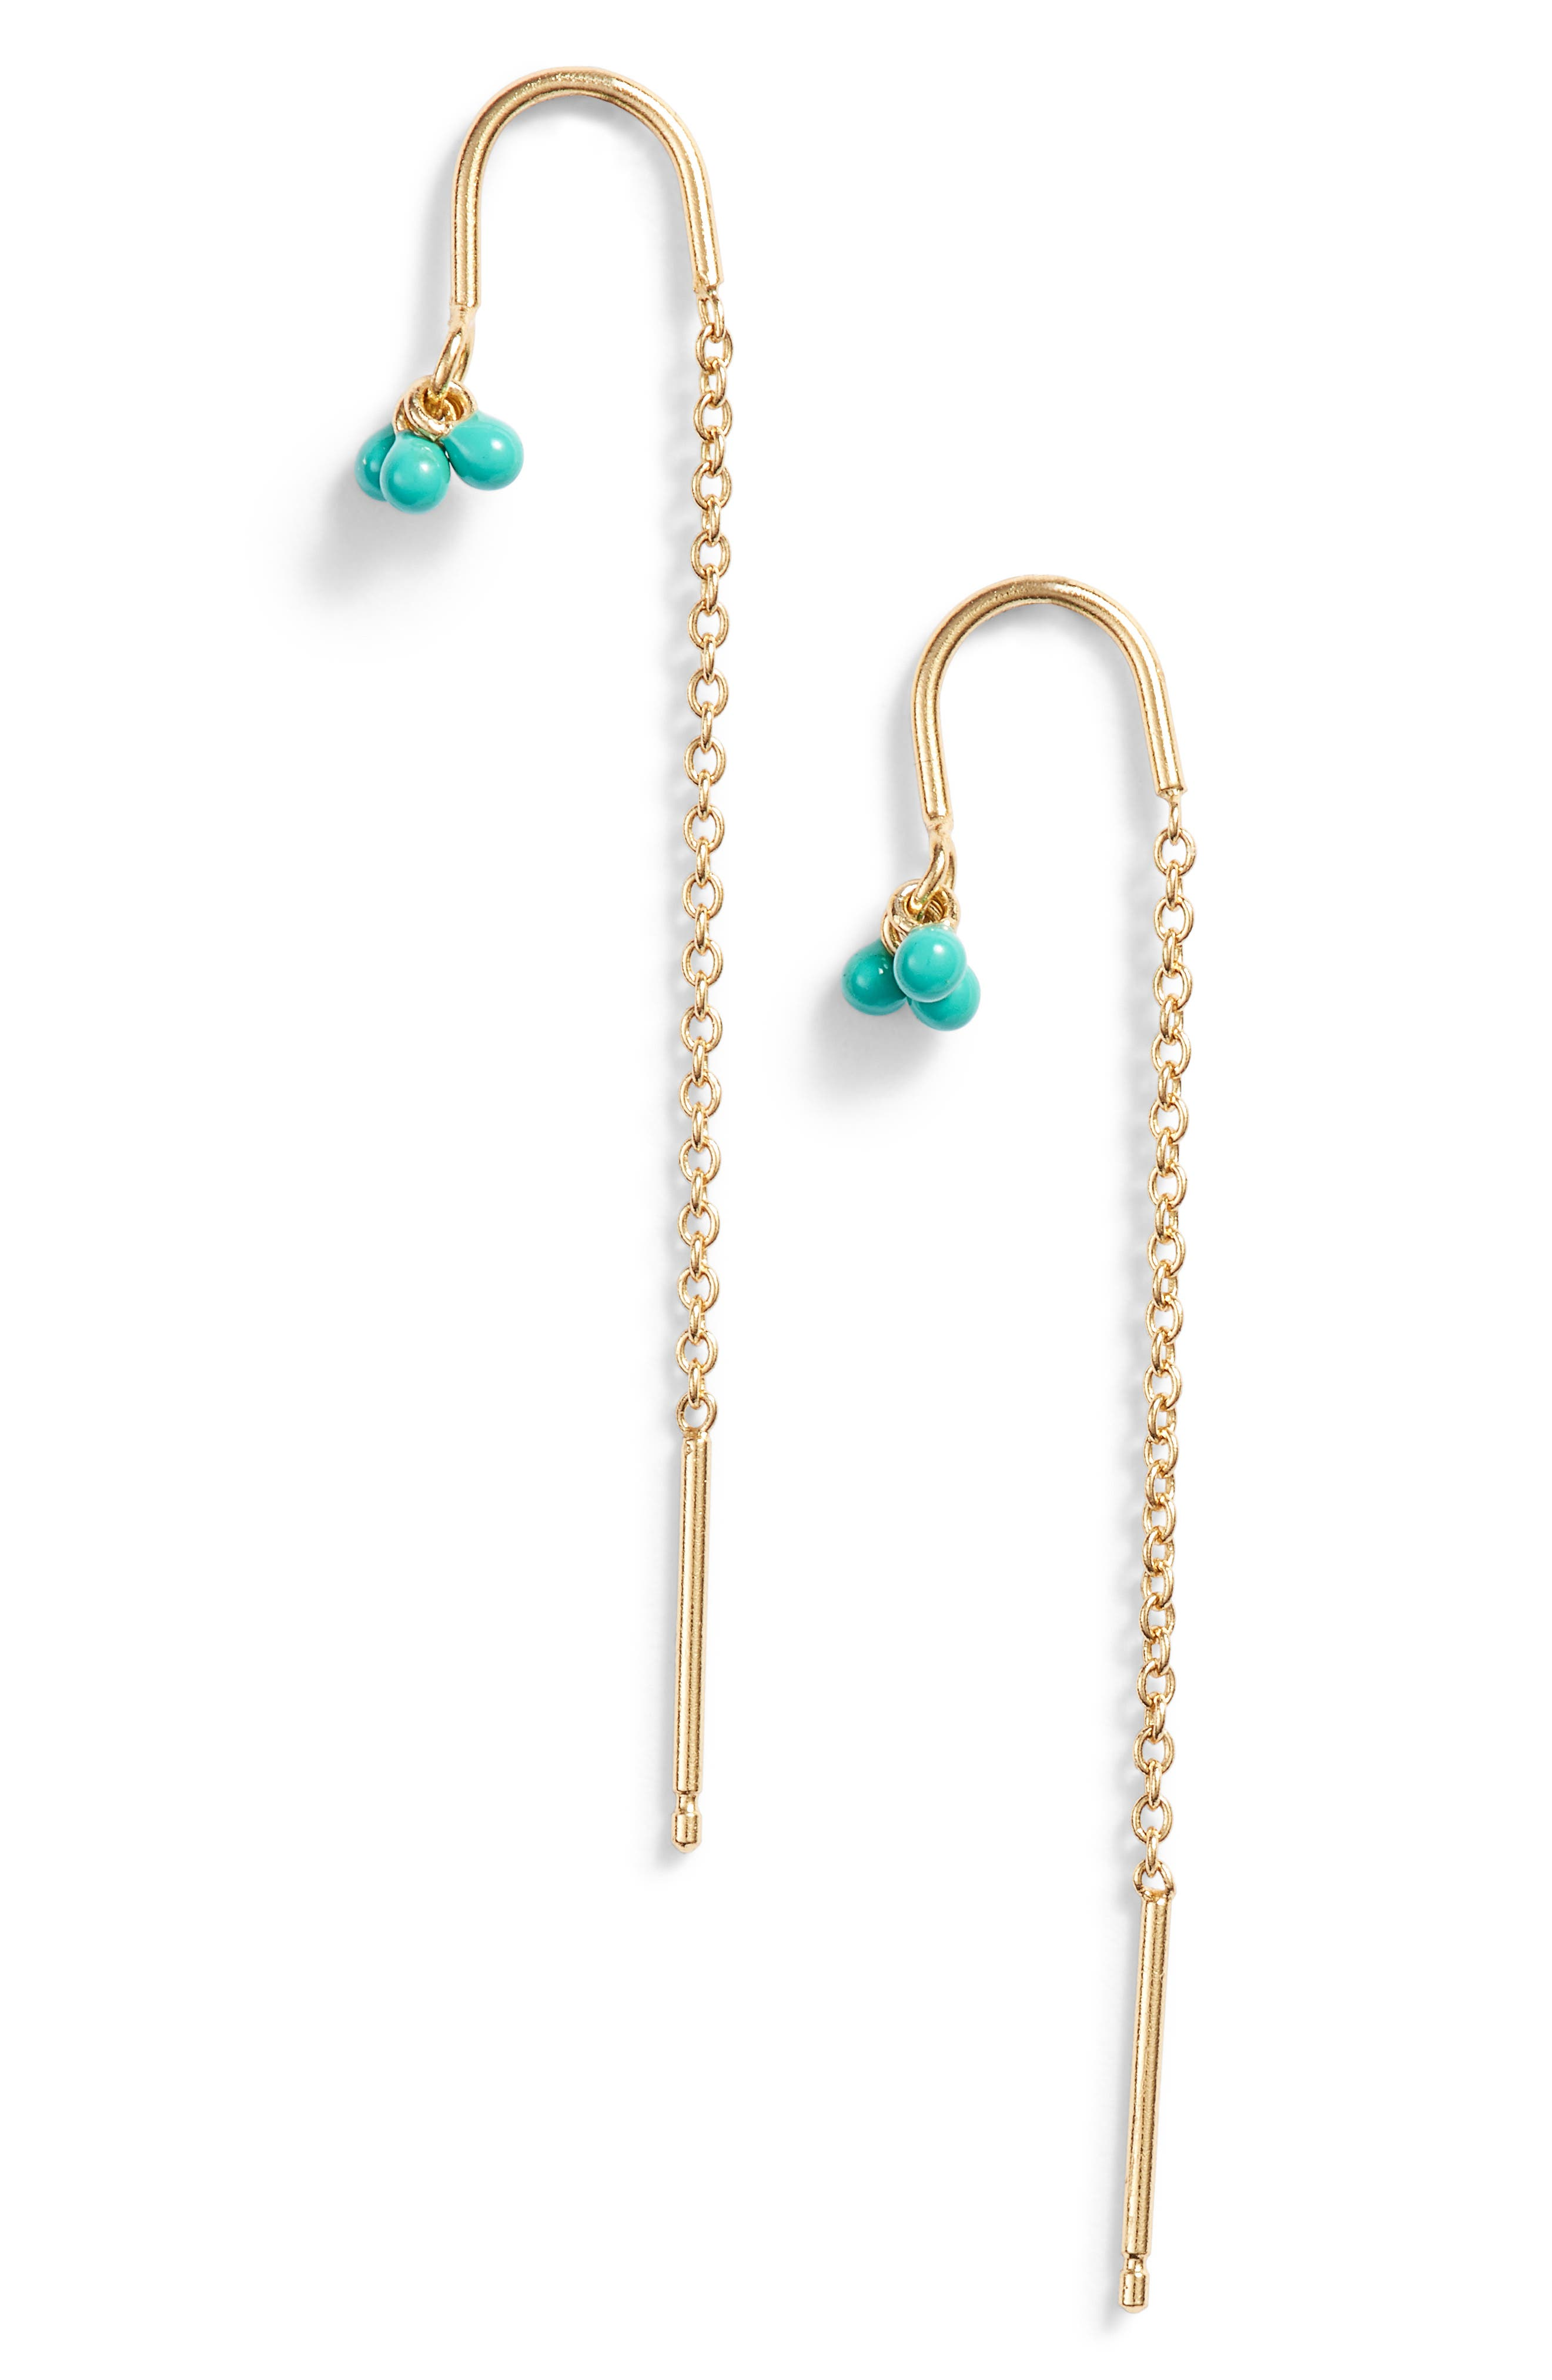 Enamel Cluster Threader Earrings,                             Main thumbnail 1, color,                             TURQUOISE